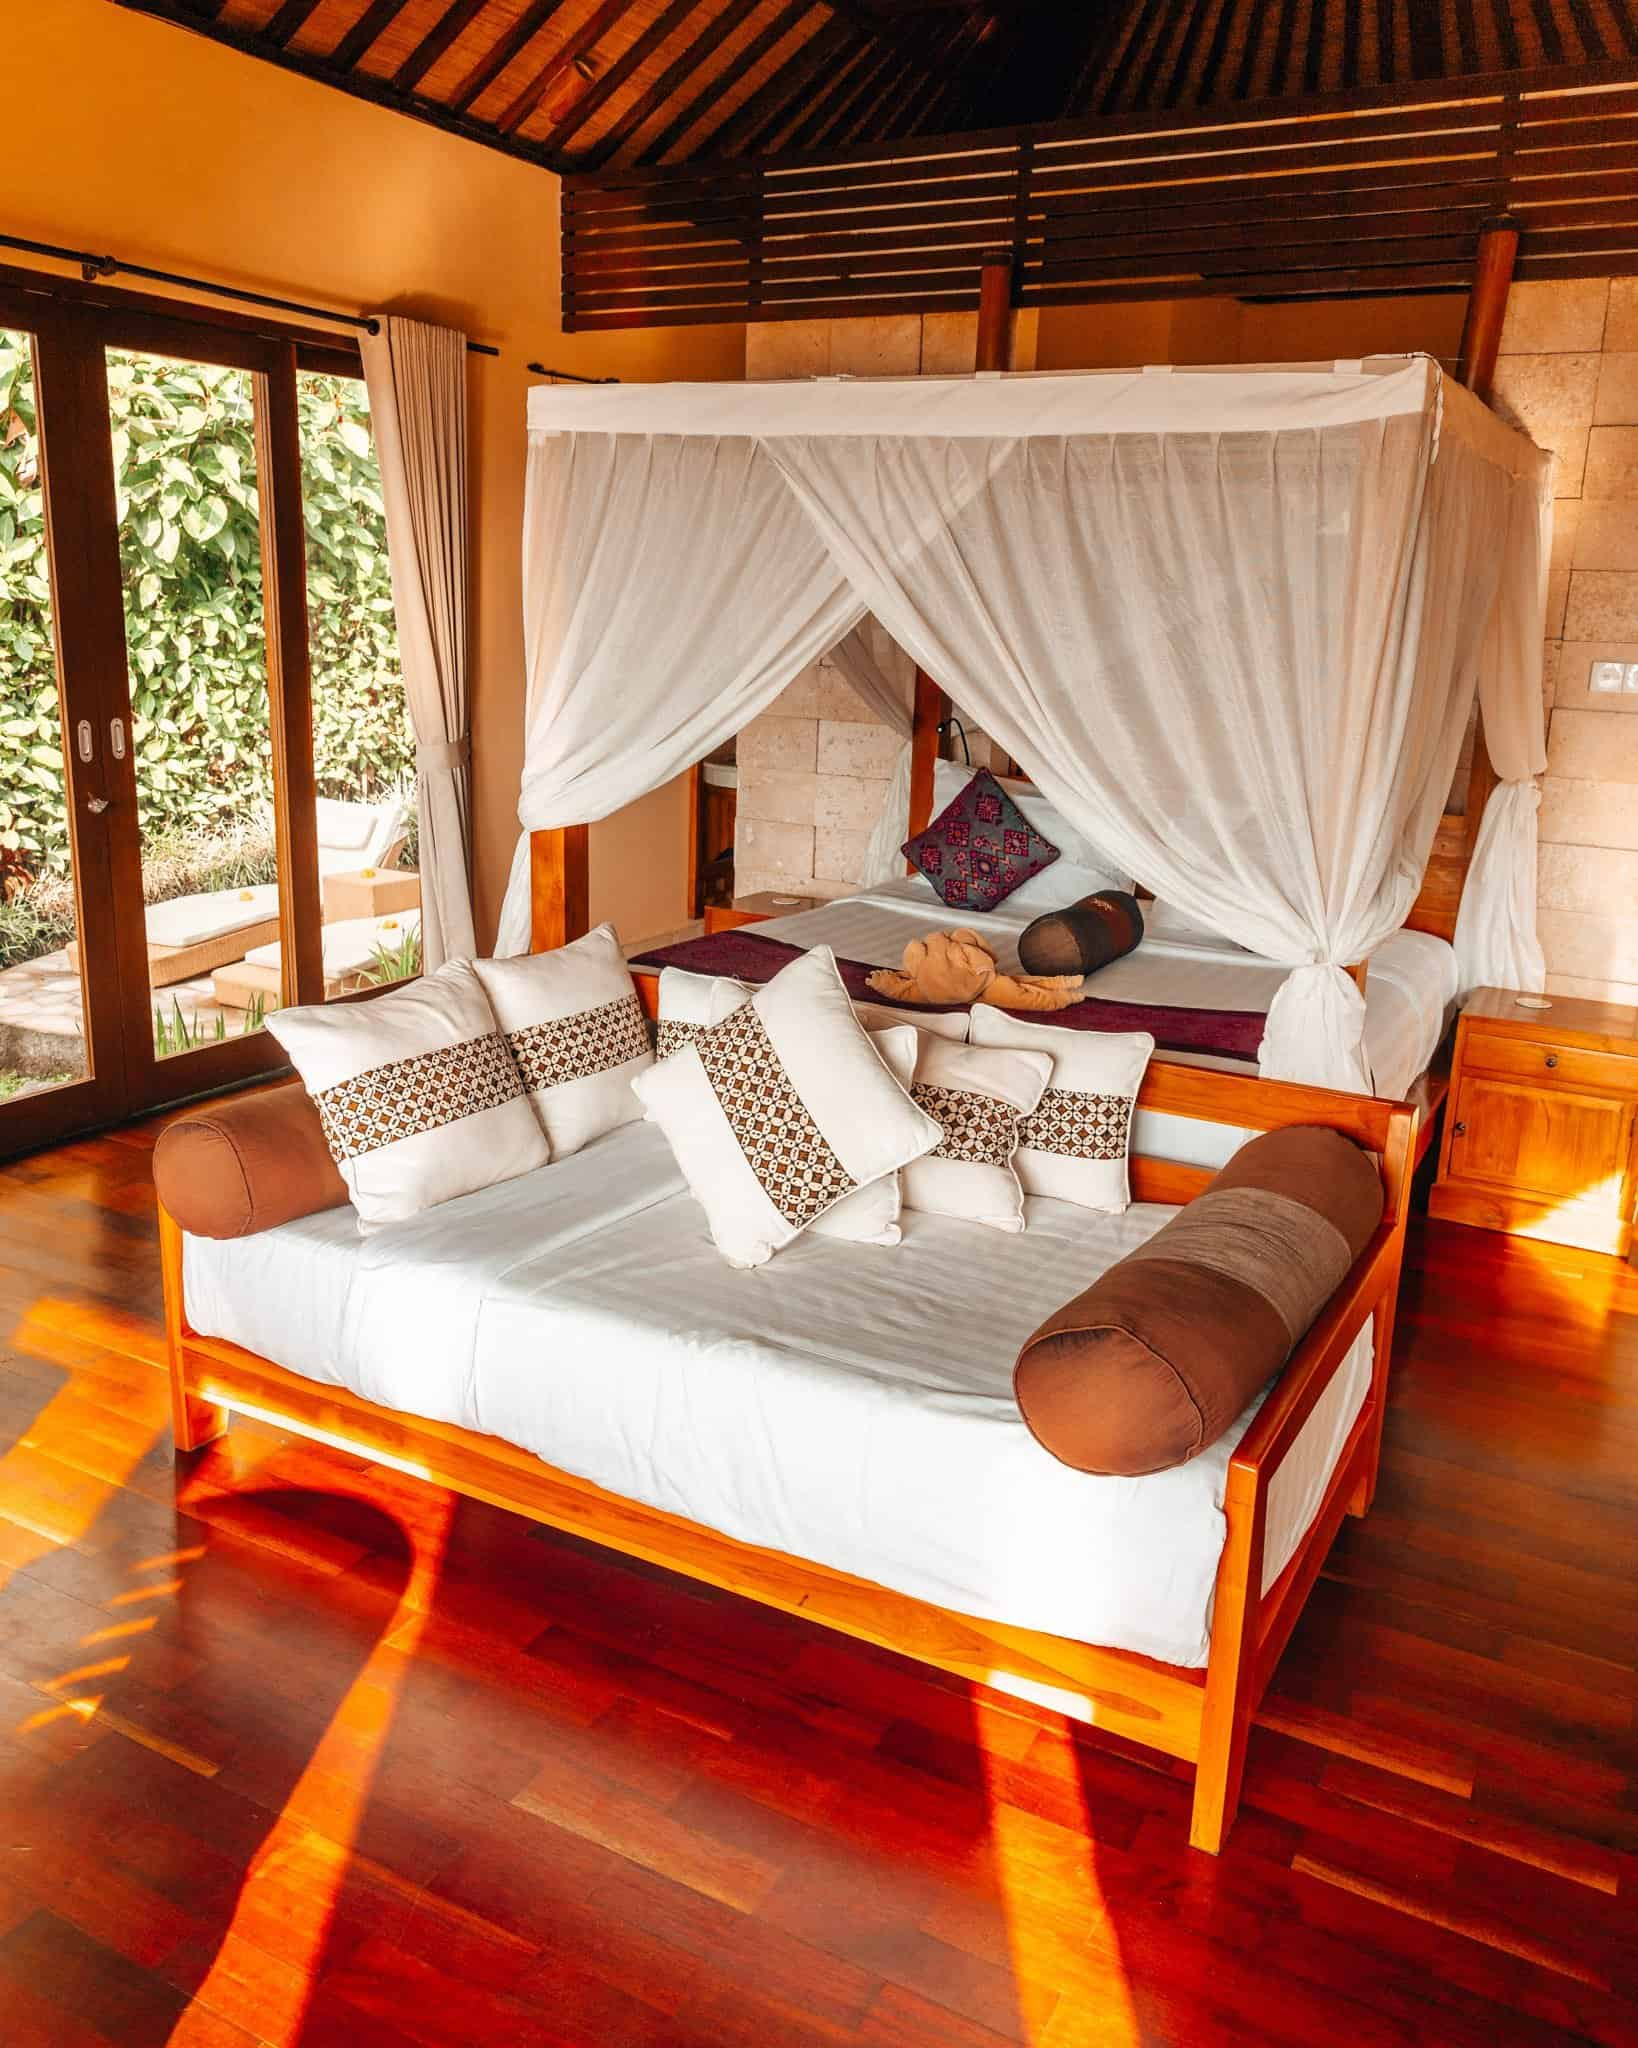 Villa at Munduk Moding Plantation Bali - The Next Trip